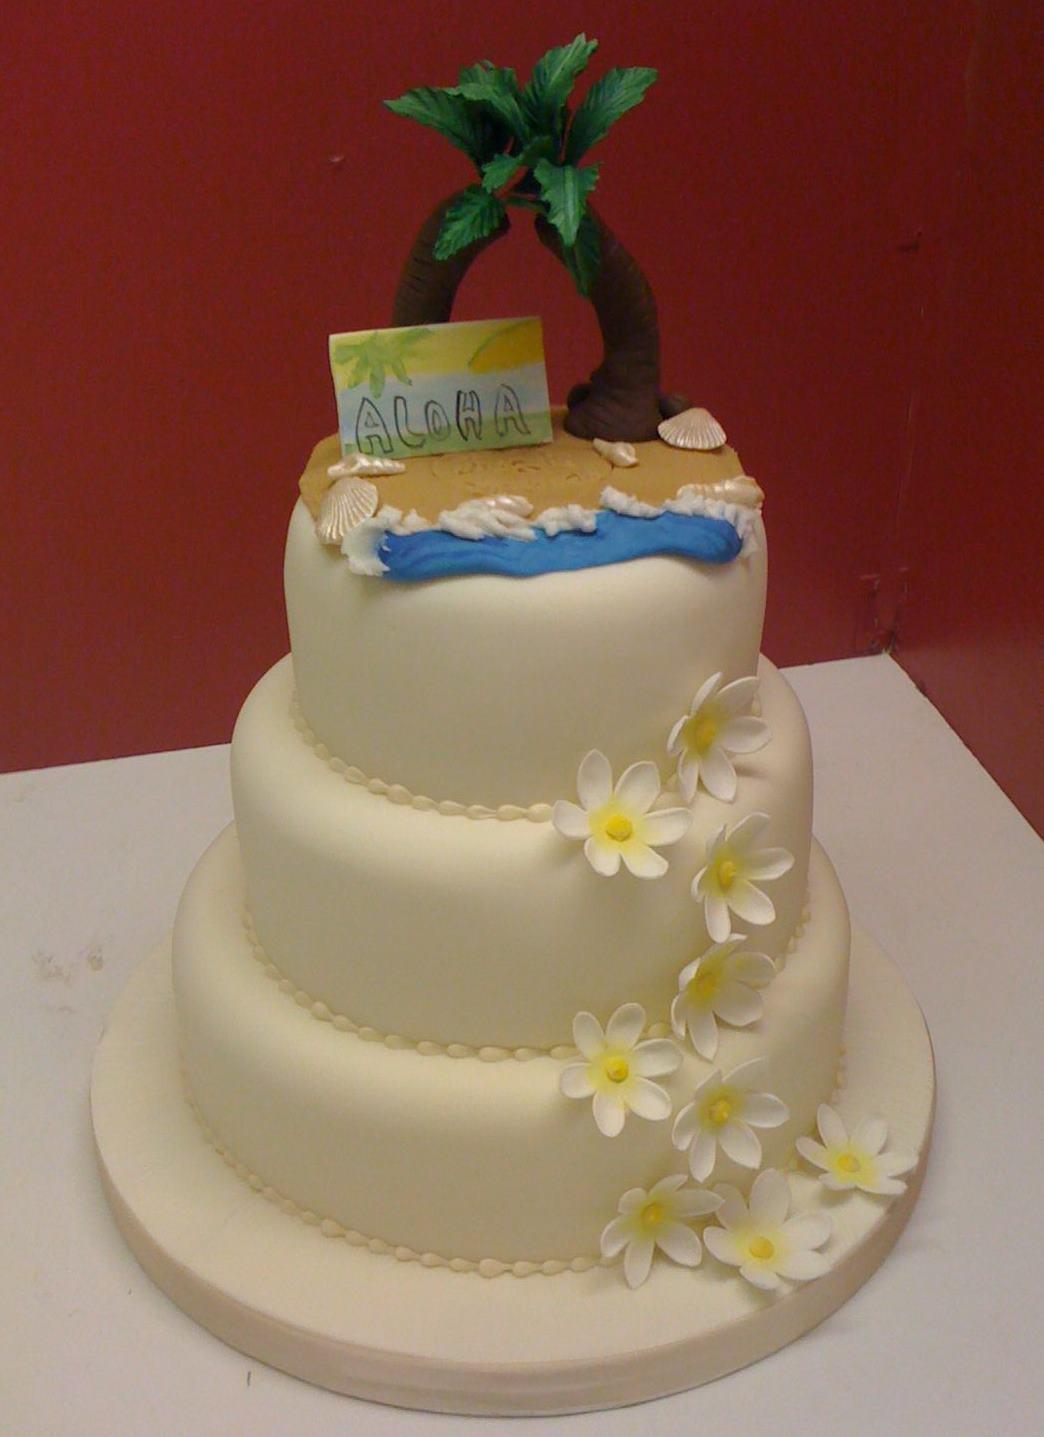 Carribean Wedding Cakes  Unfor able Wedding With Caribbean wedding cakes idea